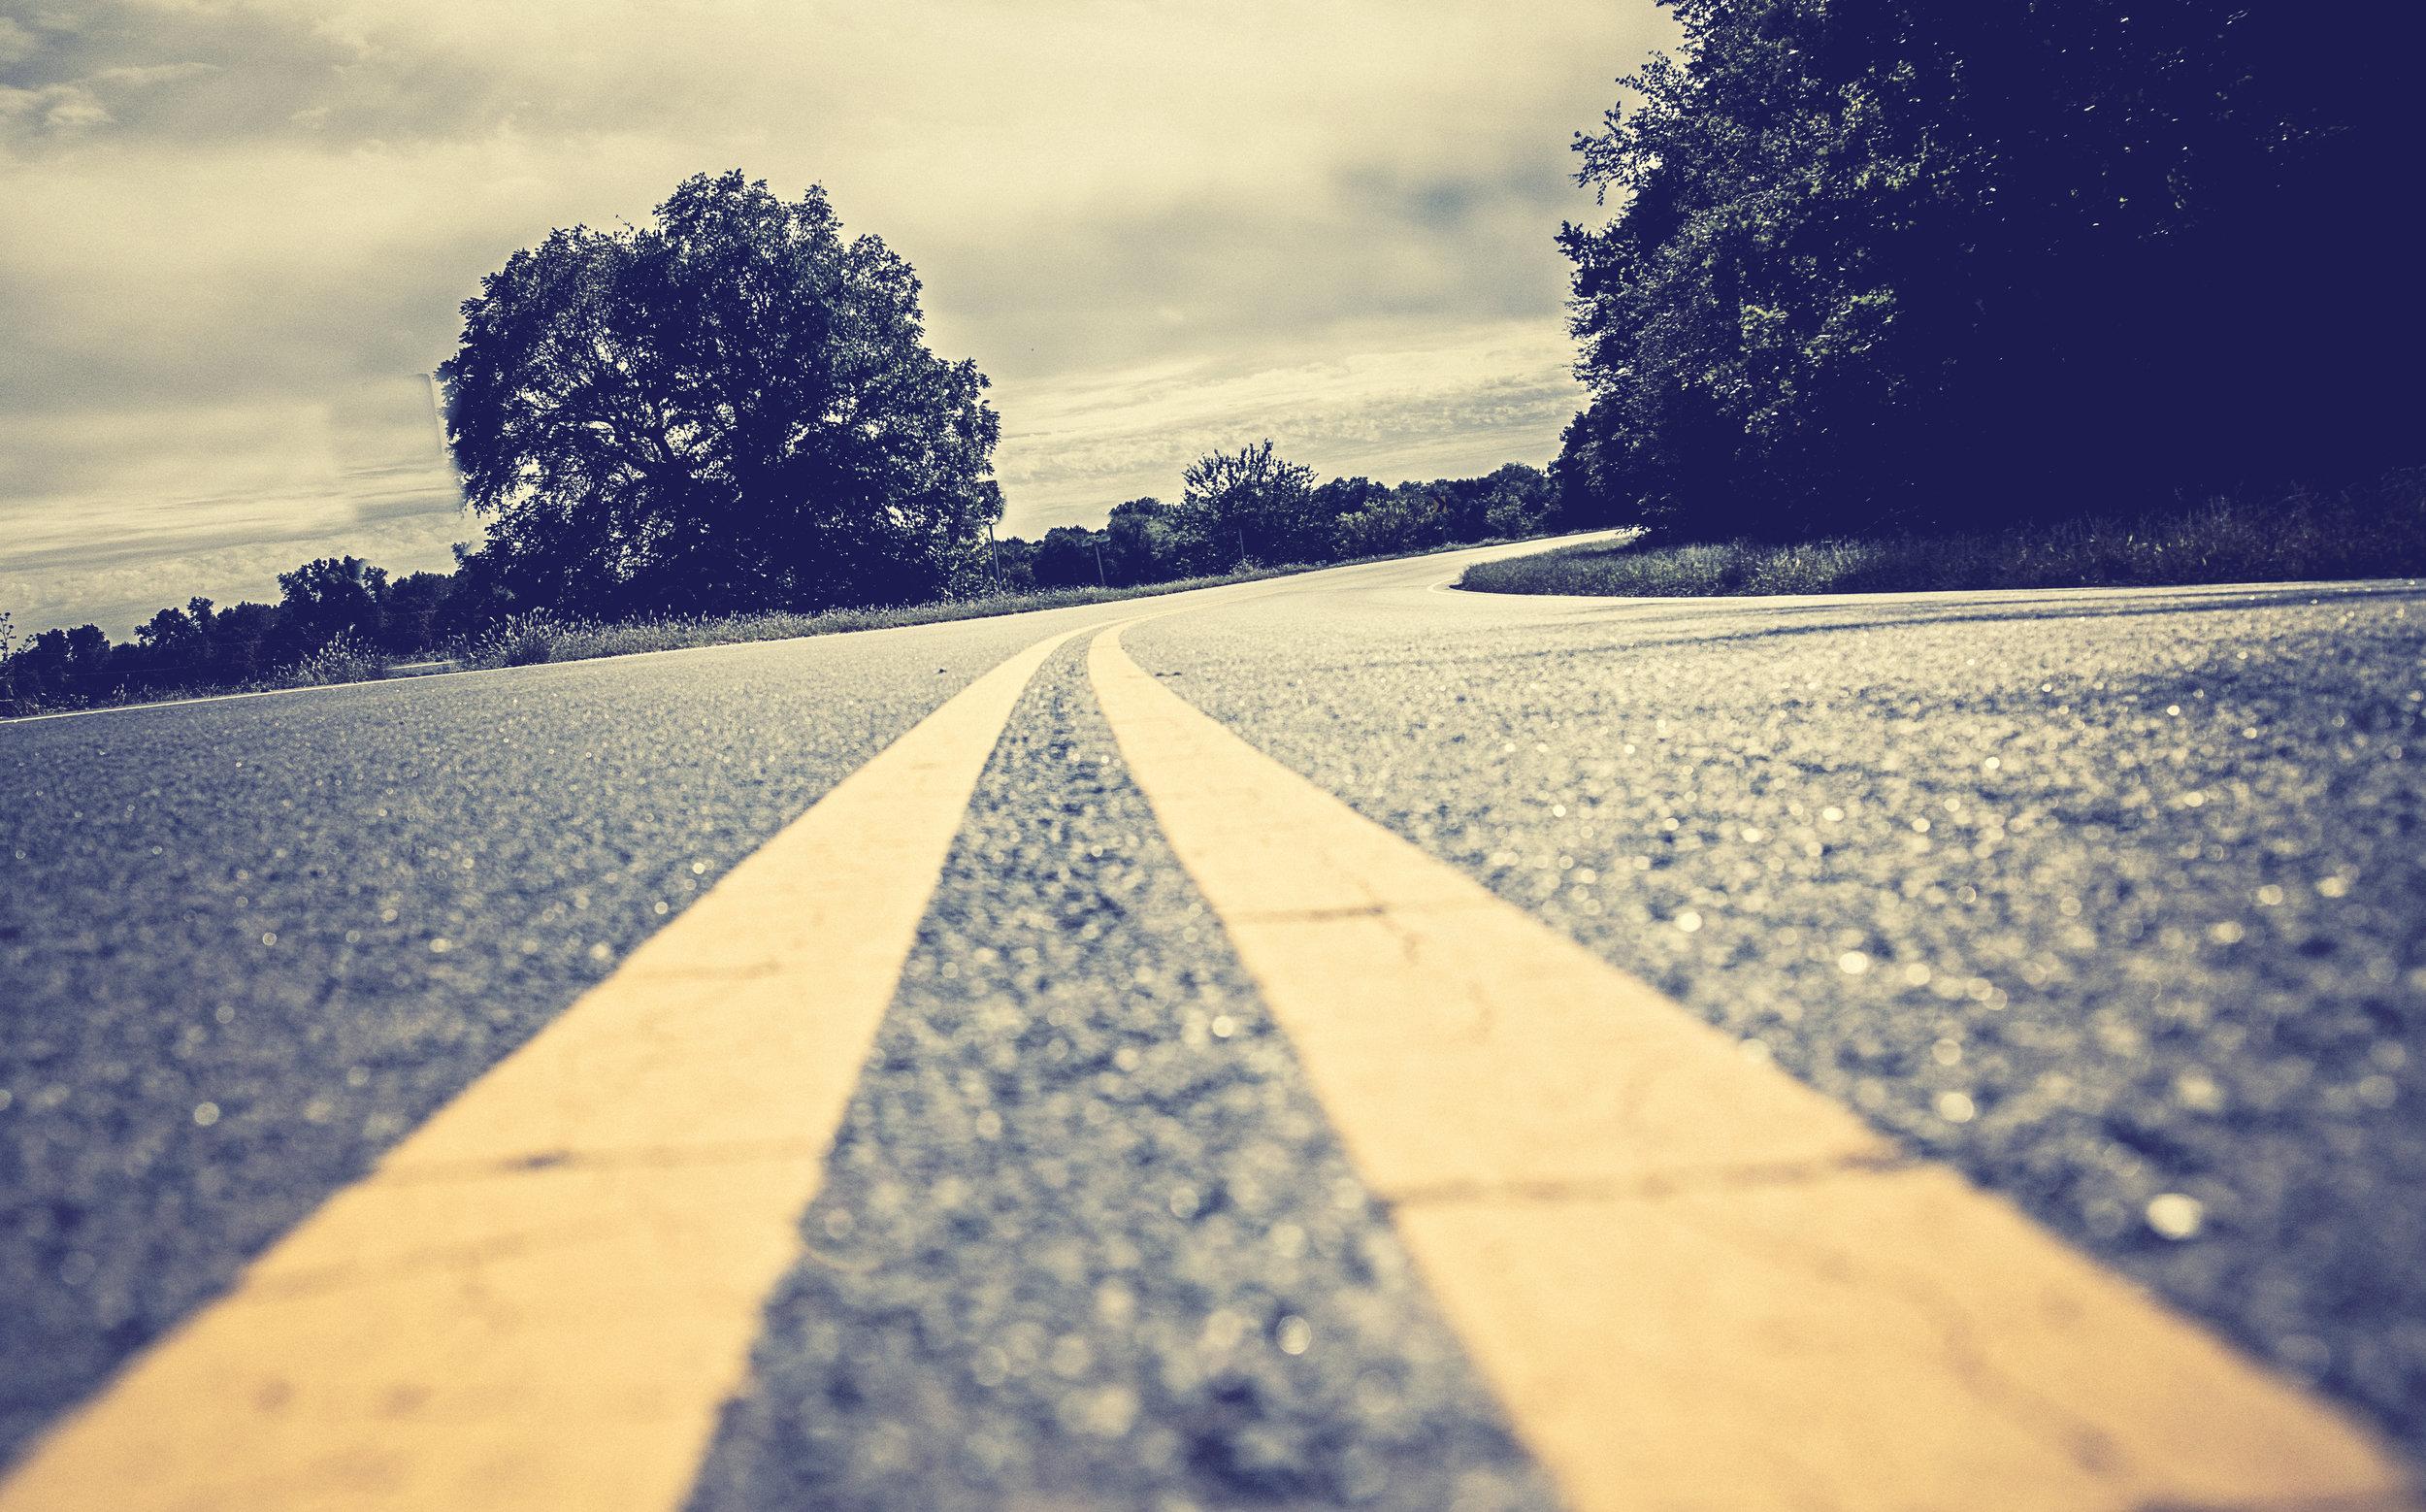 Road_Curve_Ahead.jpg